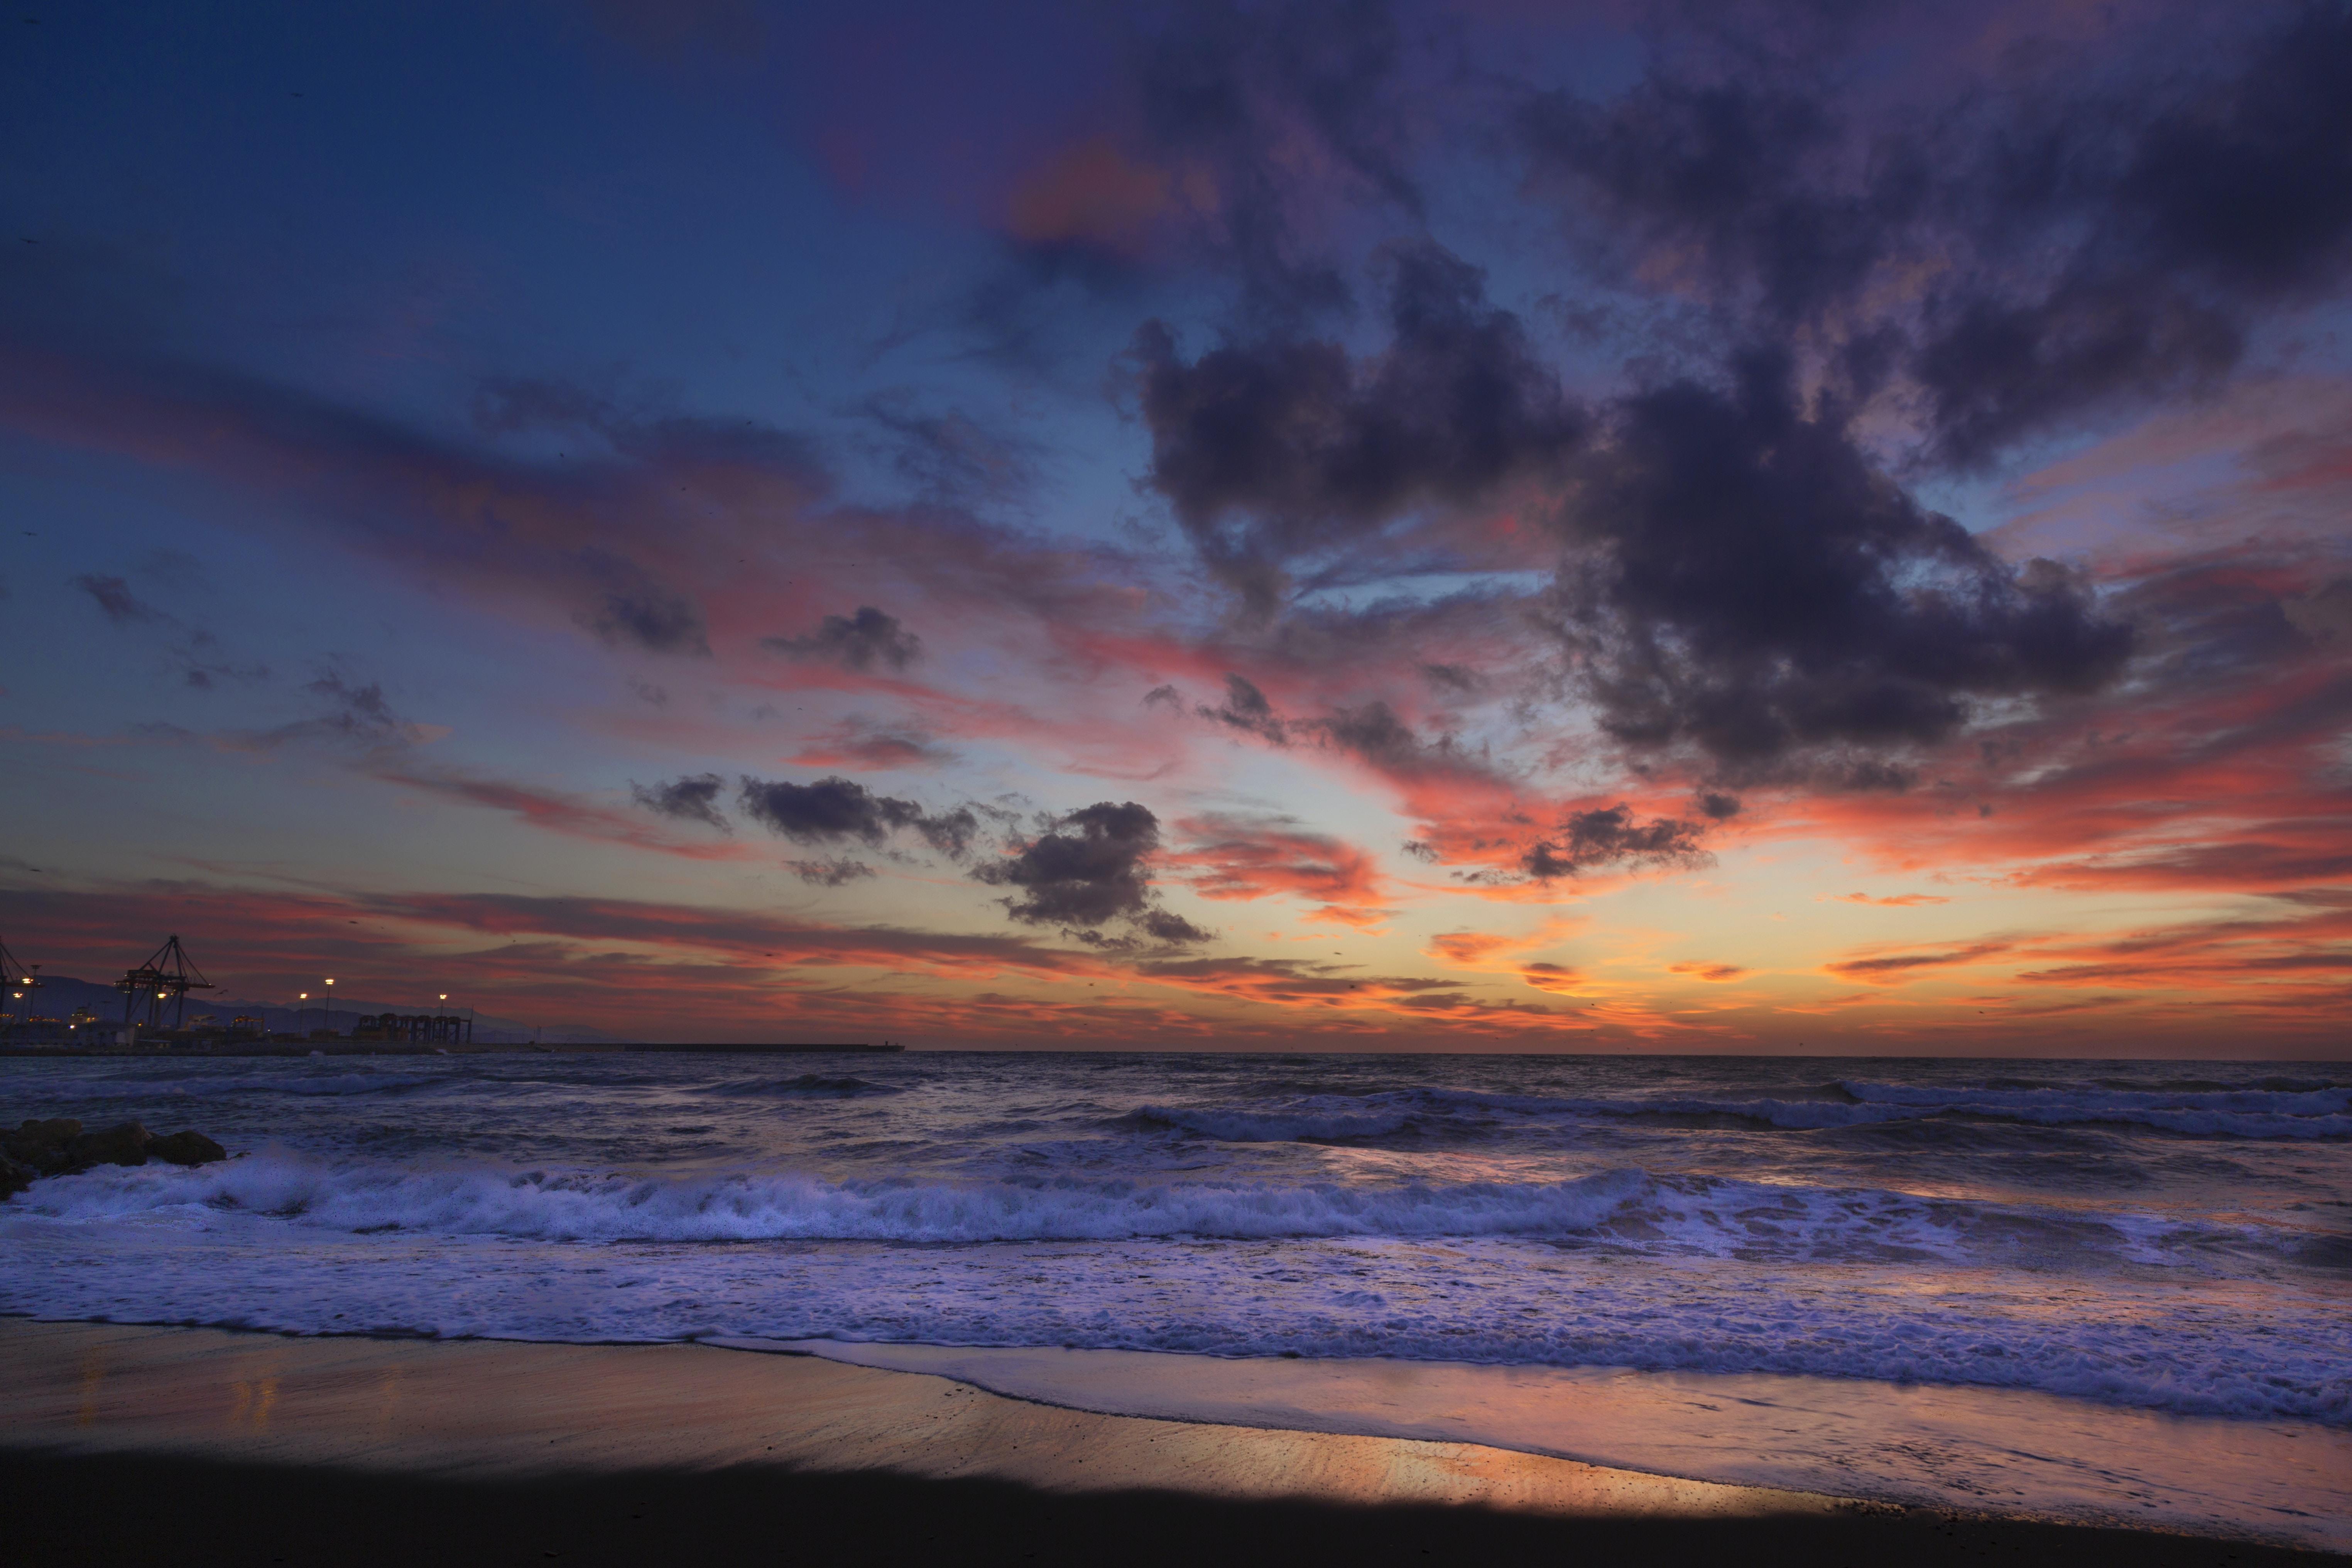 ocean waves near seashore during golden hour